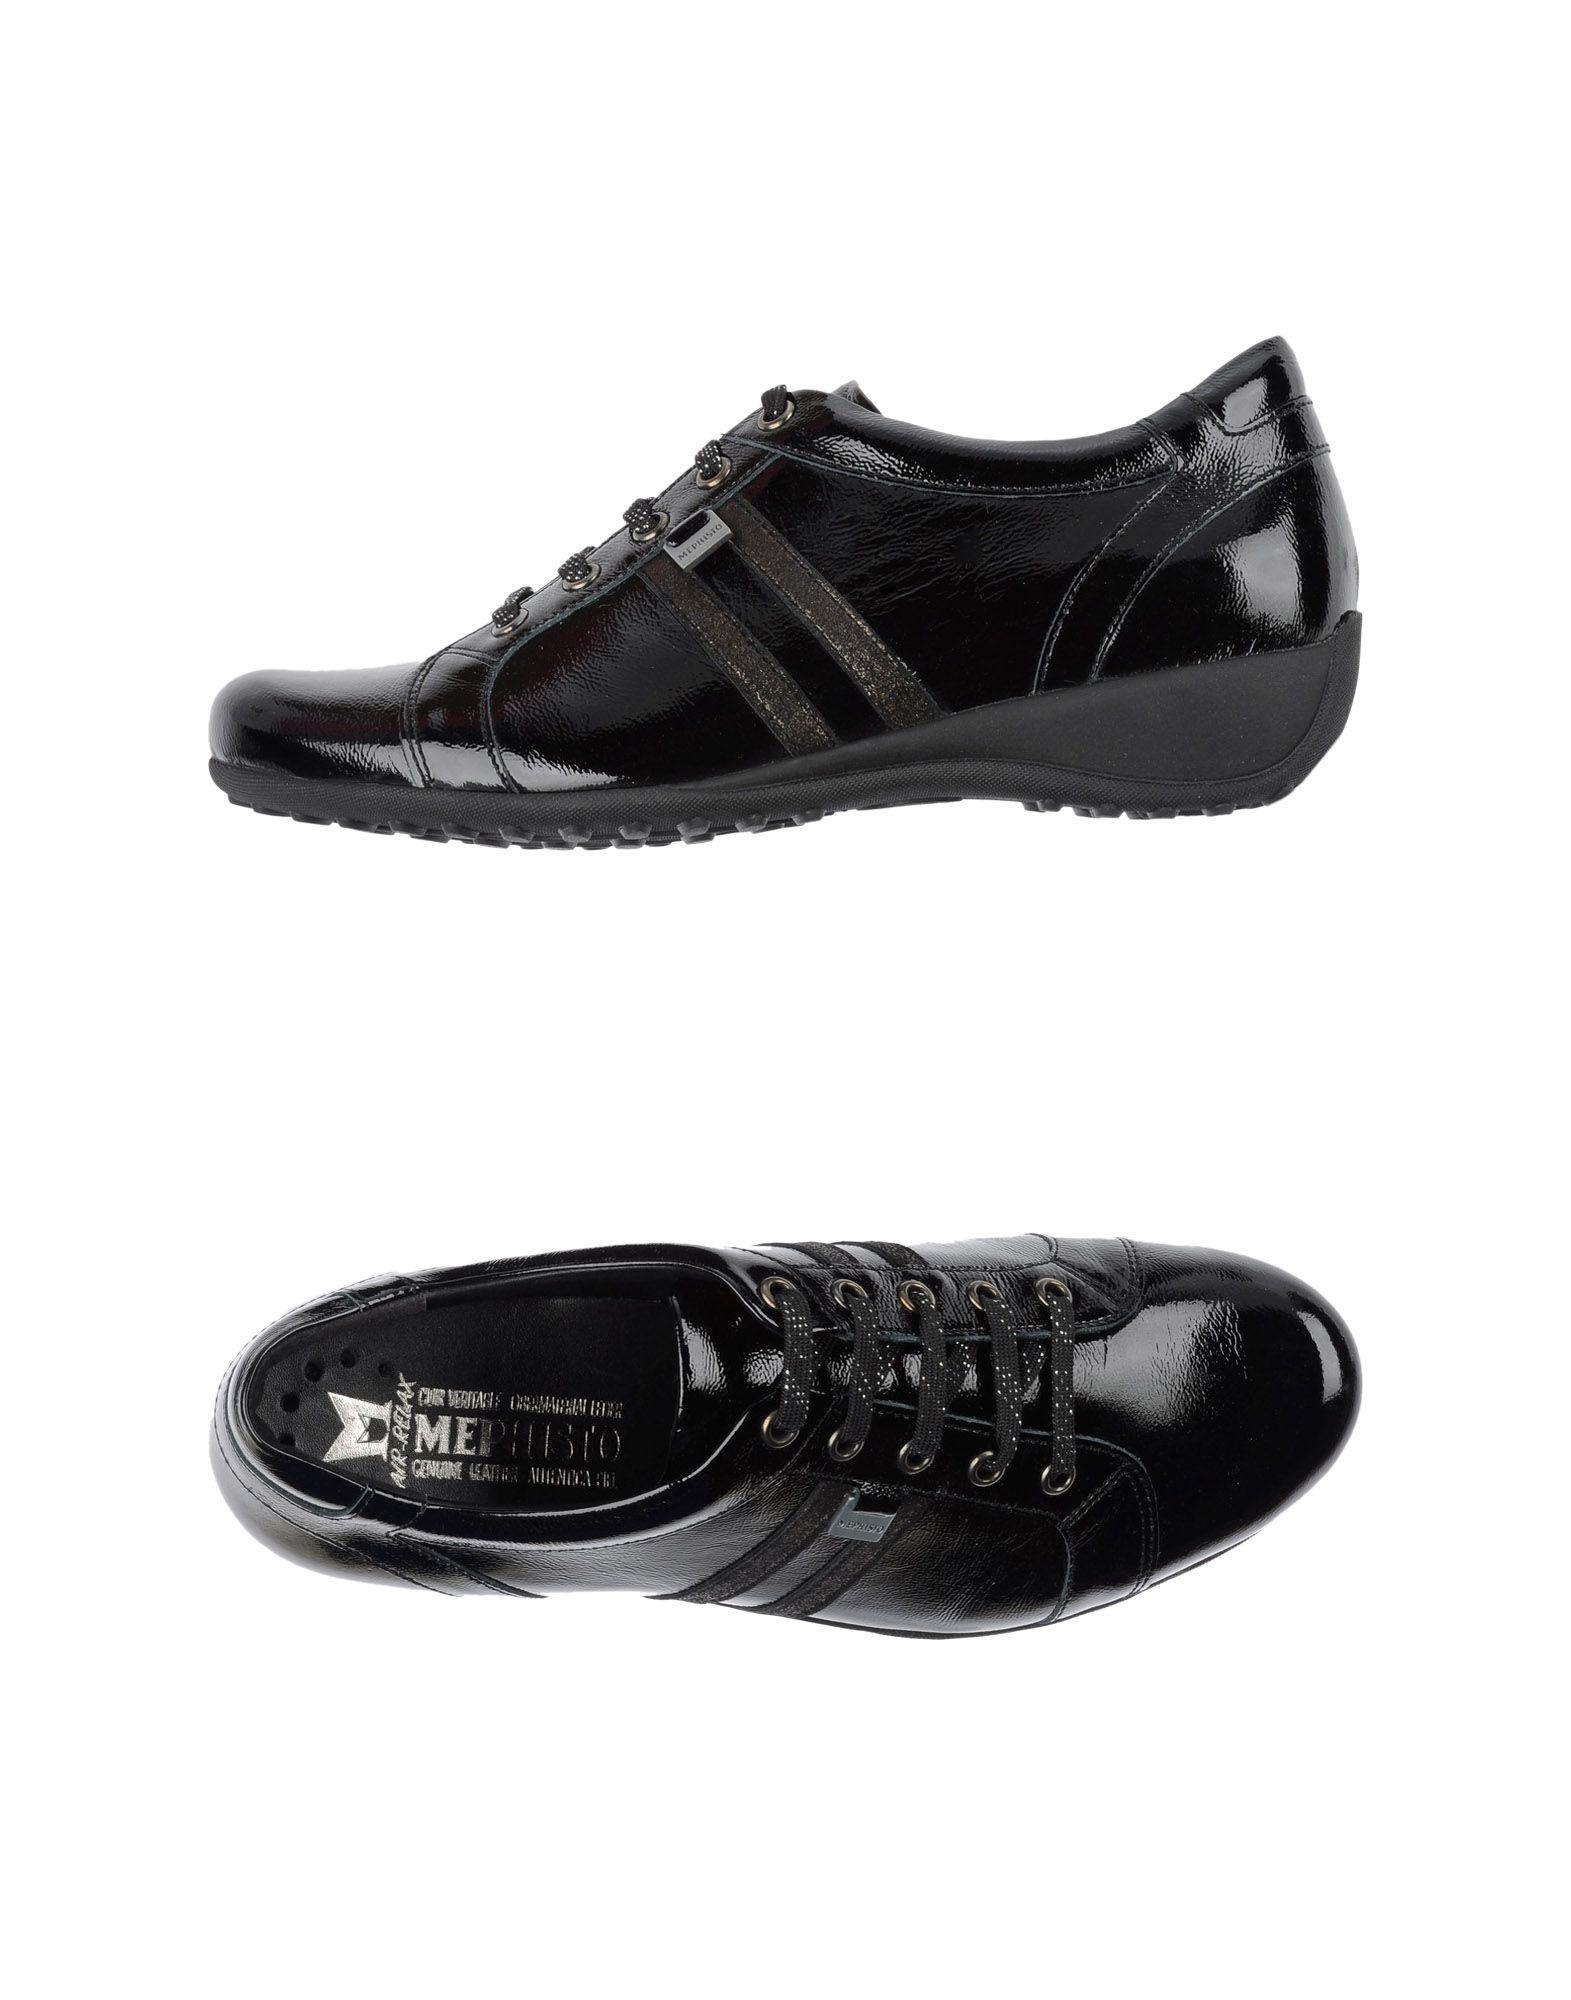 Stilvolle billige Schuhe Damen Mephisto Sneakers Damen Schuhe  44863874DS 781f4f